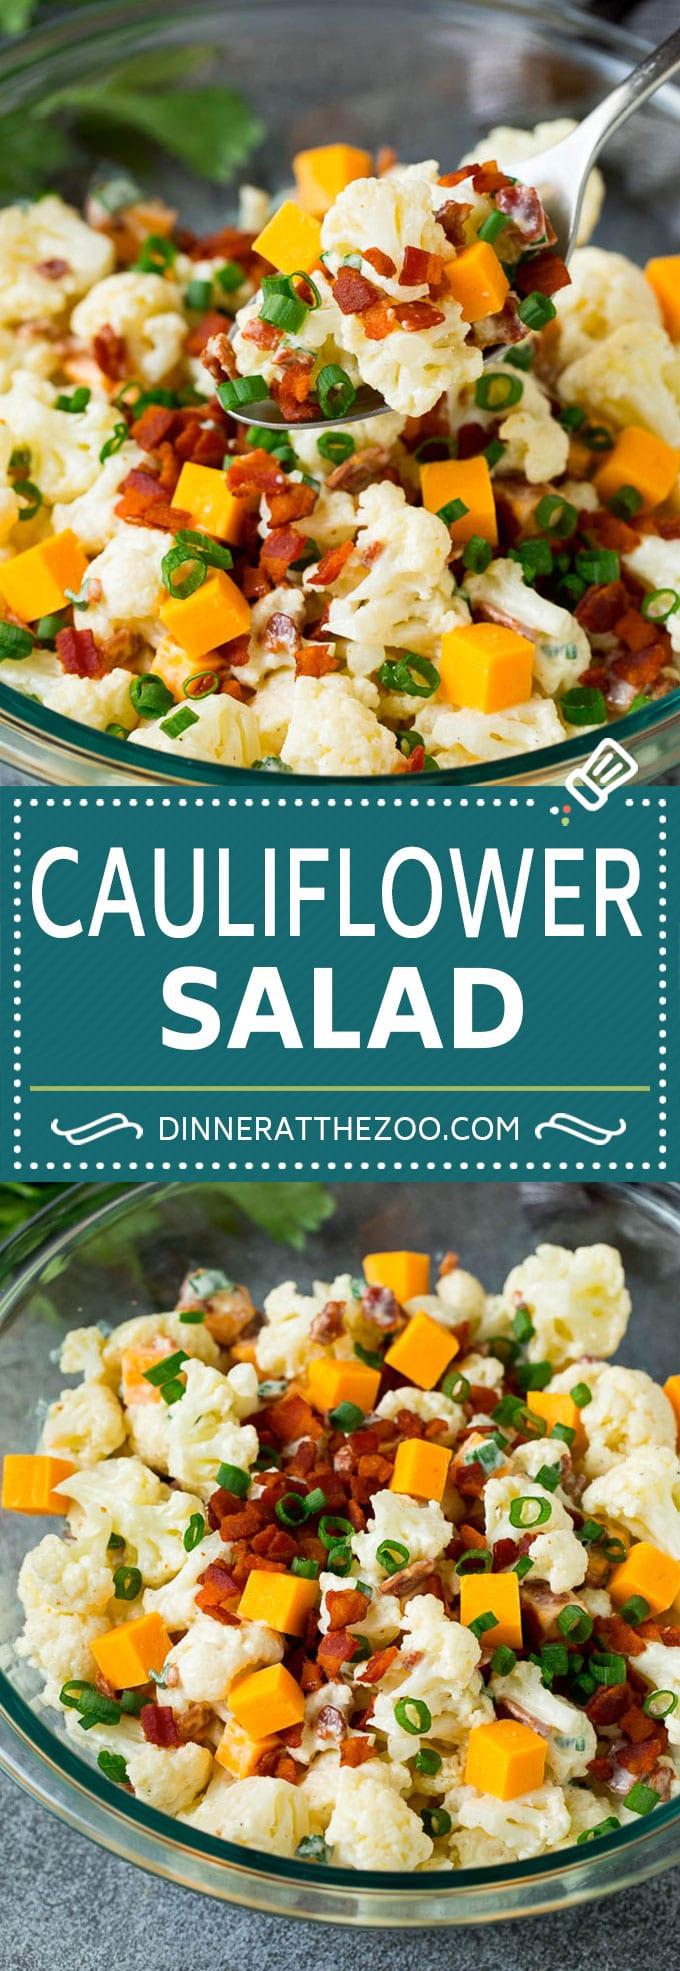 Cauliflower Salad Recipe #salad #cauliflower #bacon #lowcarb #keto #dinner #dinneratthezoo